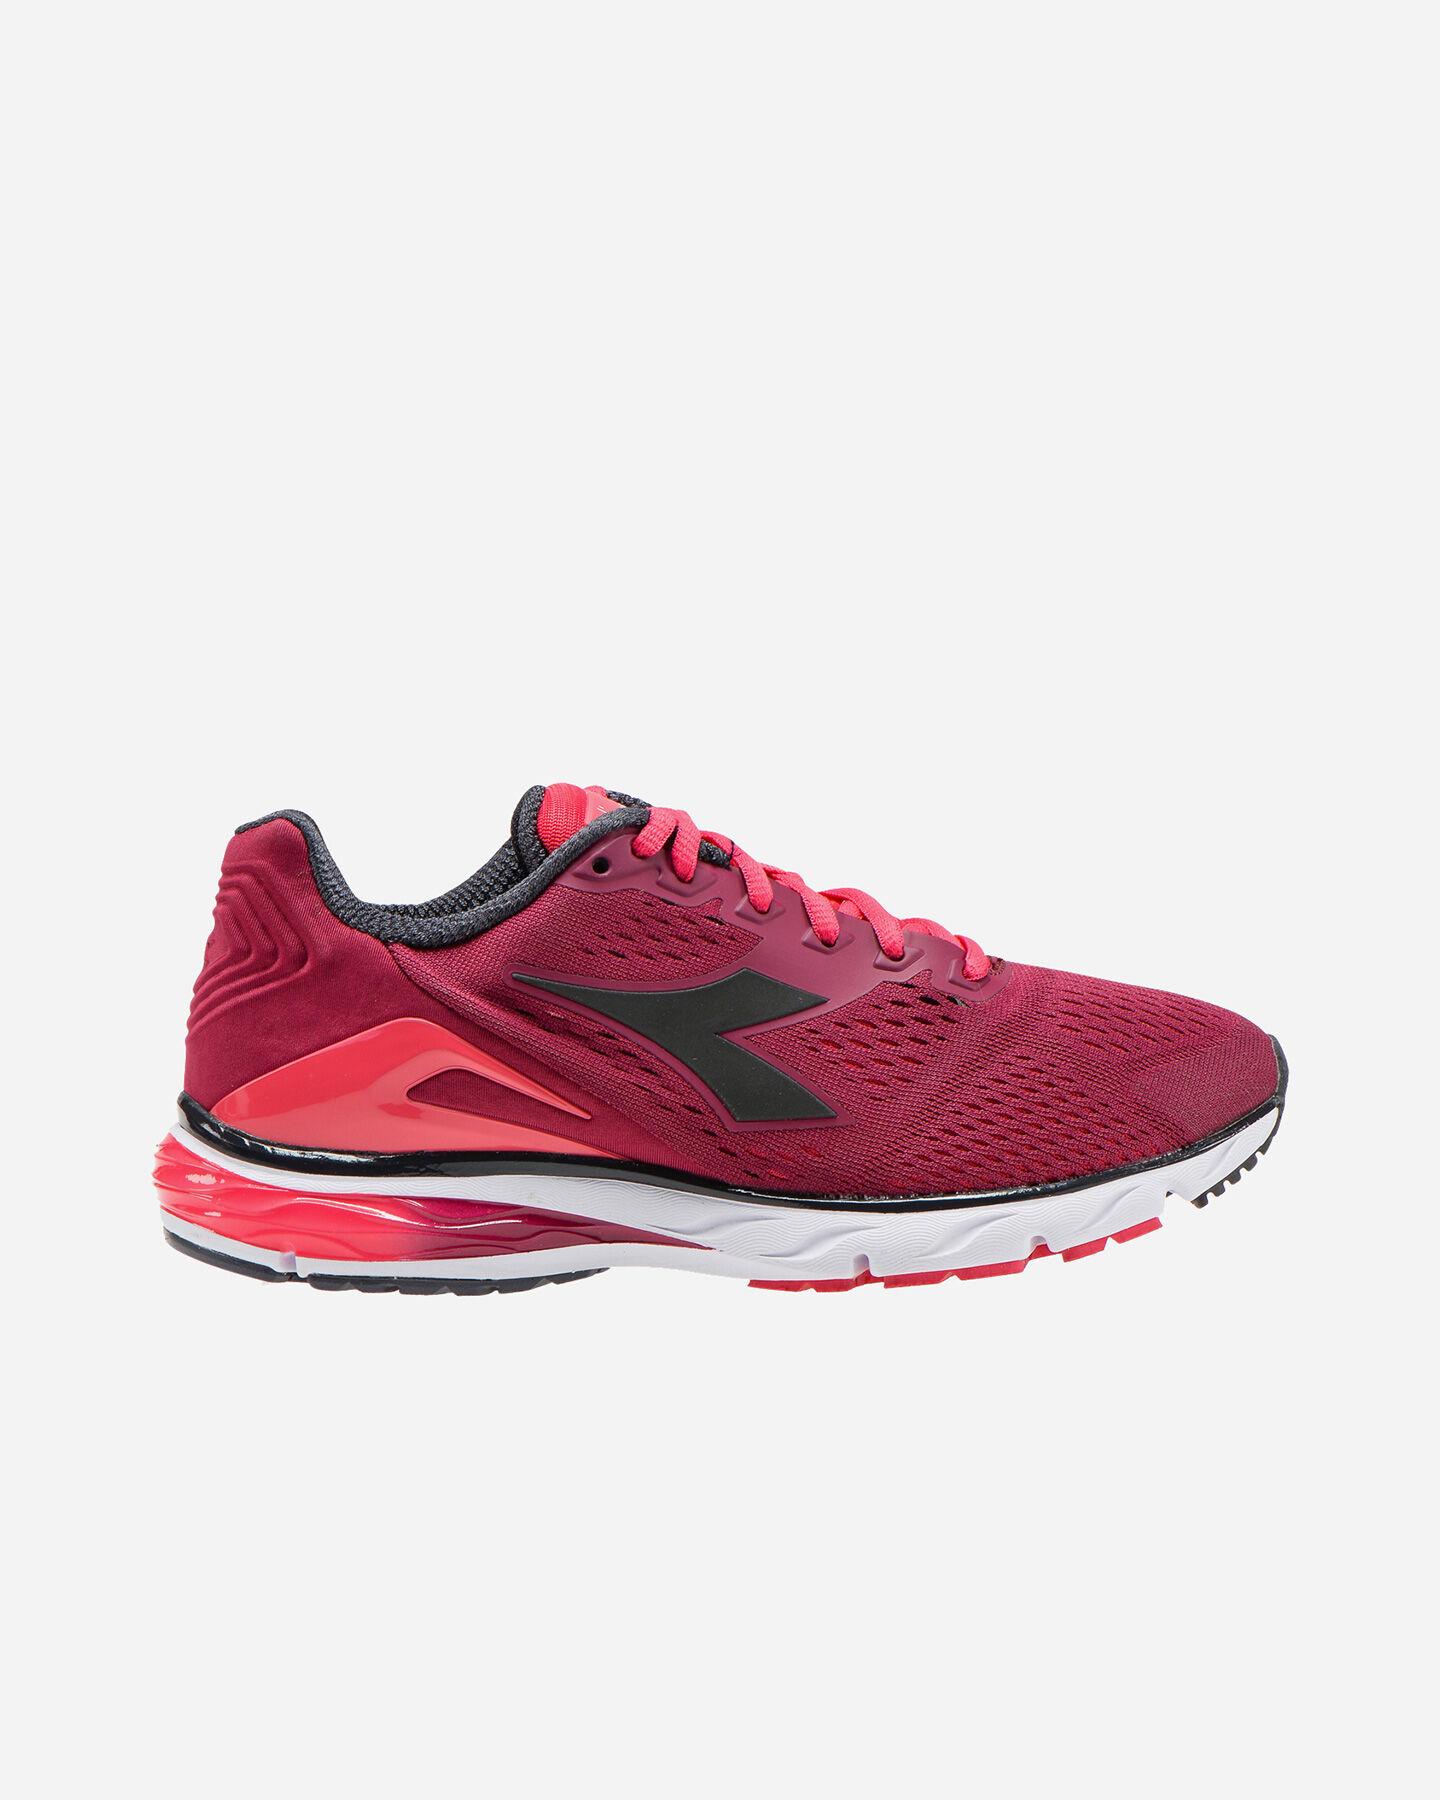 Acquista scarpe running a2 brooks - OFF31% sconti db25e8e520c